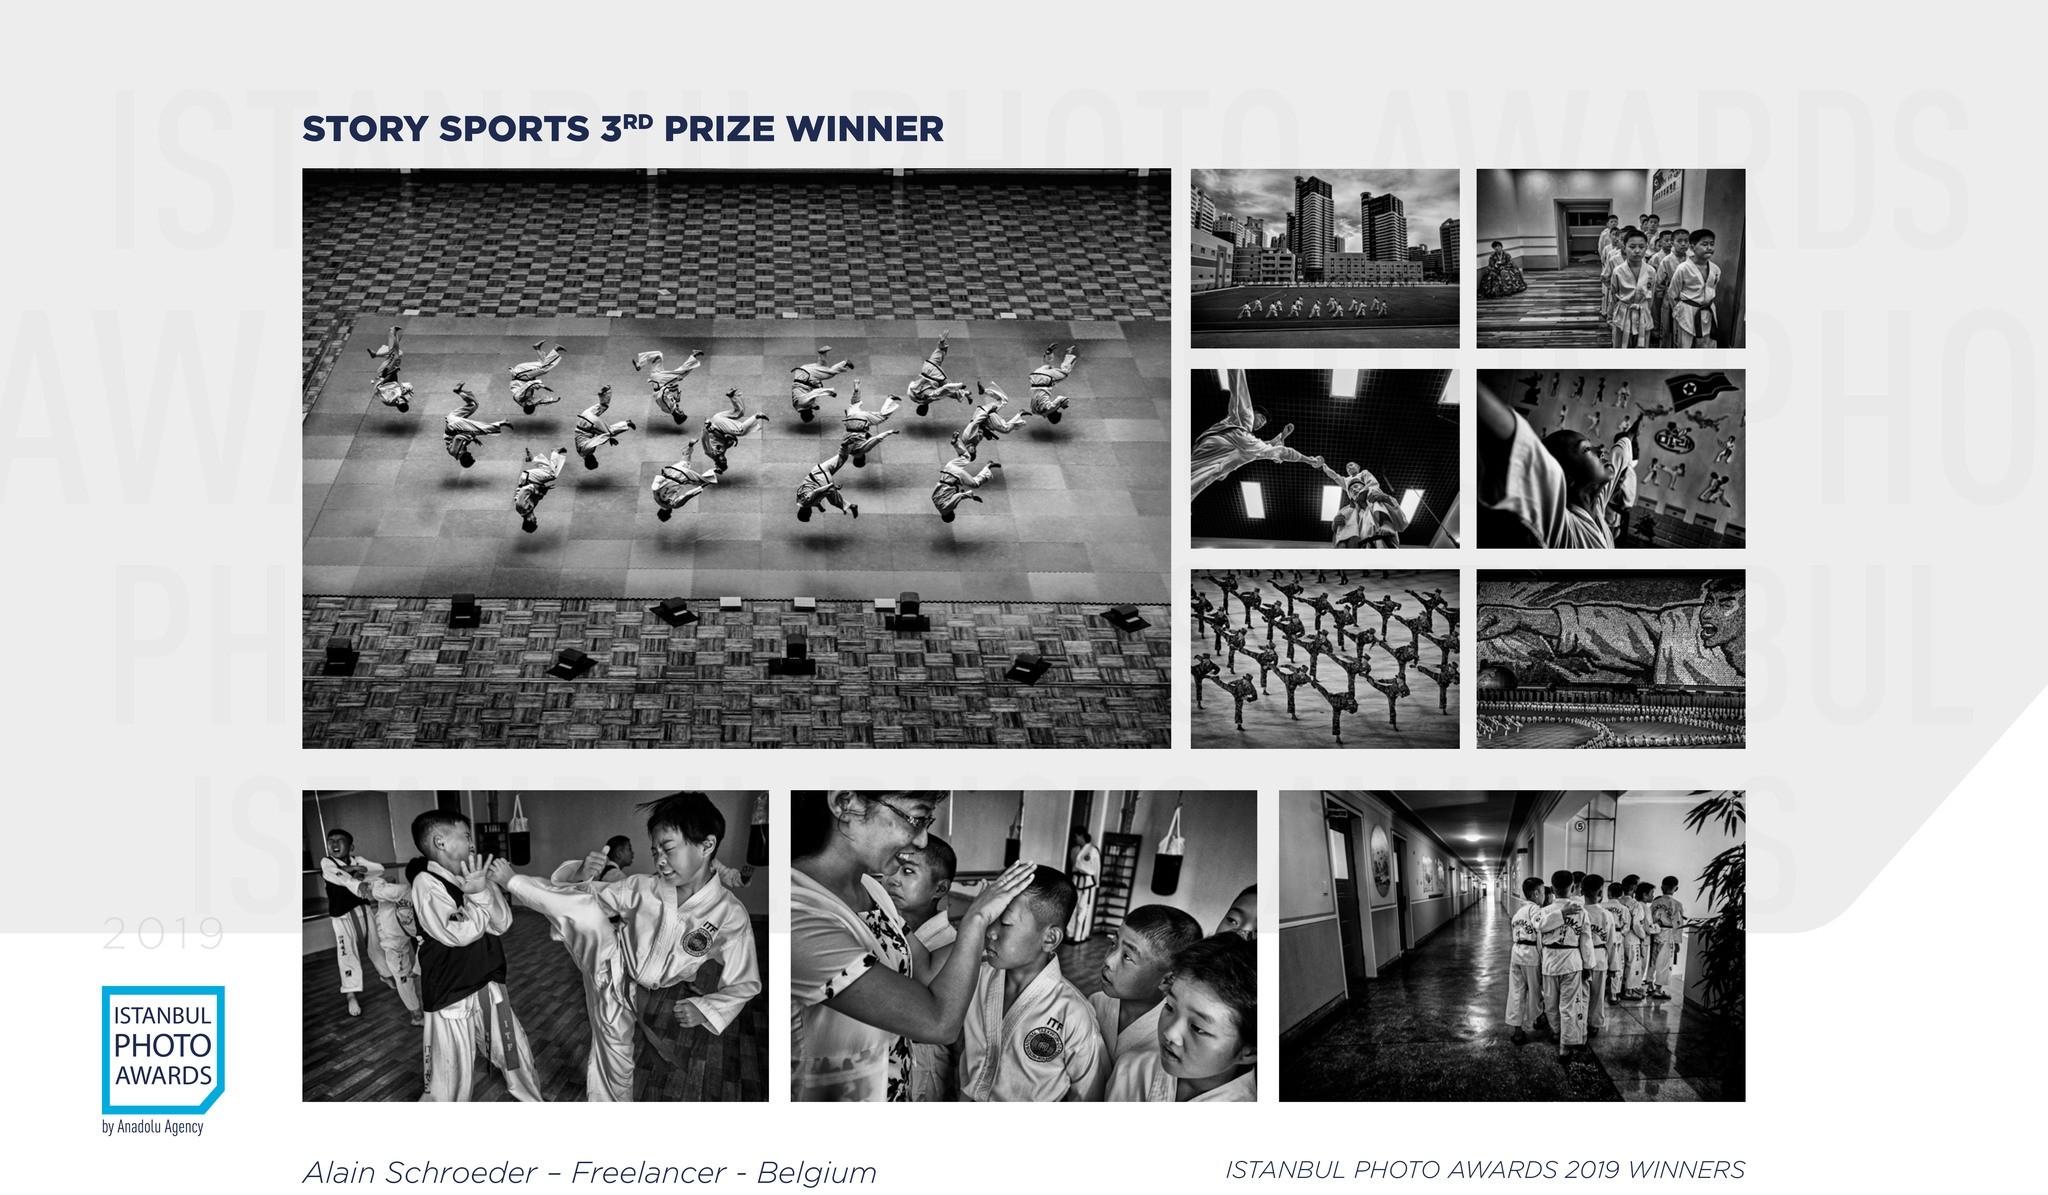 Story Sports 3rd Prize — Taekwondo North Korea Style